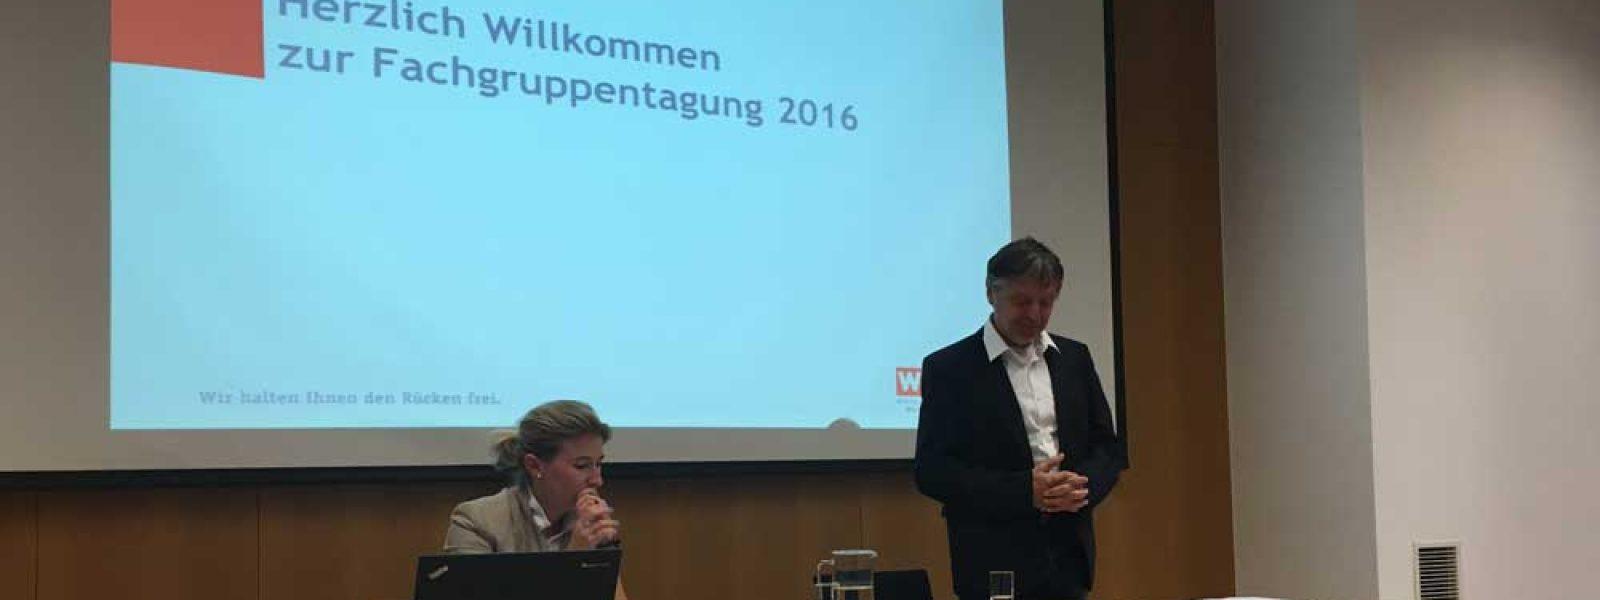 fachgruppentagung-2016-01